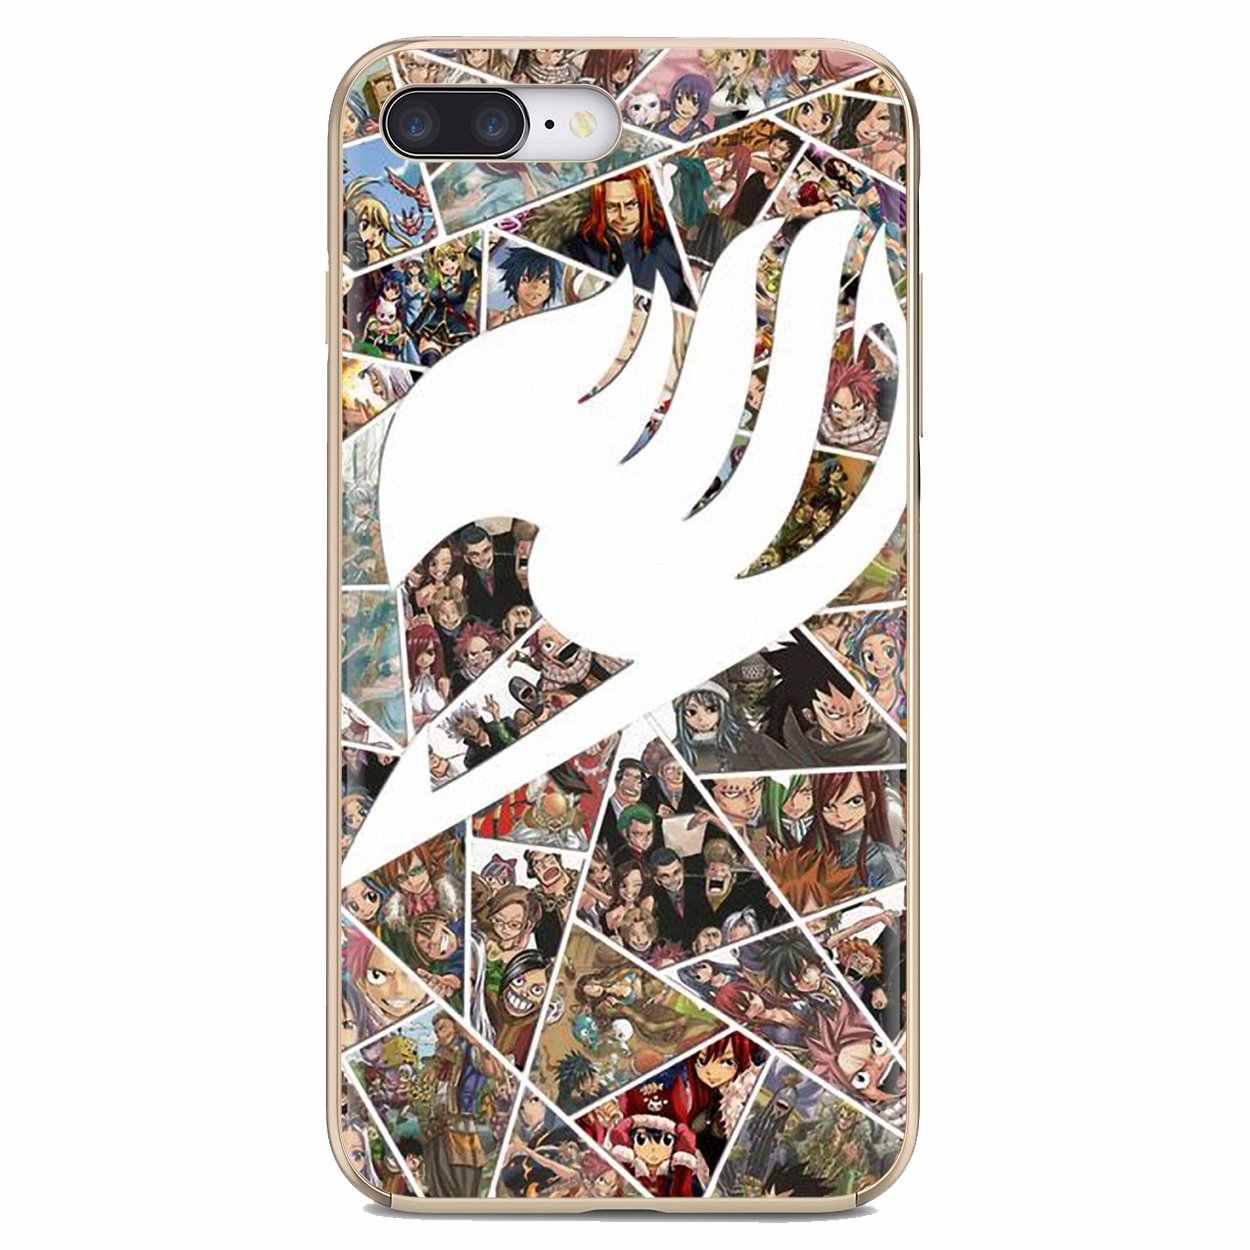 JAPAN หายาก Fairy หางครอบครัวสำหรับ Huawei G7 G8 P7 P8 P9 P10 P20 P30 Lite Mini Pro P สมาร์ท 2017 2018 2019 ซิลิโคน